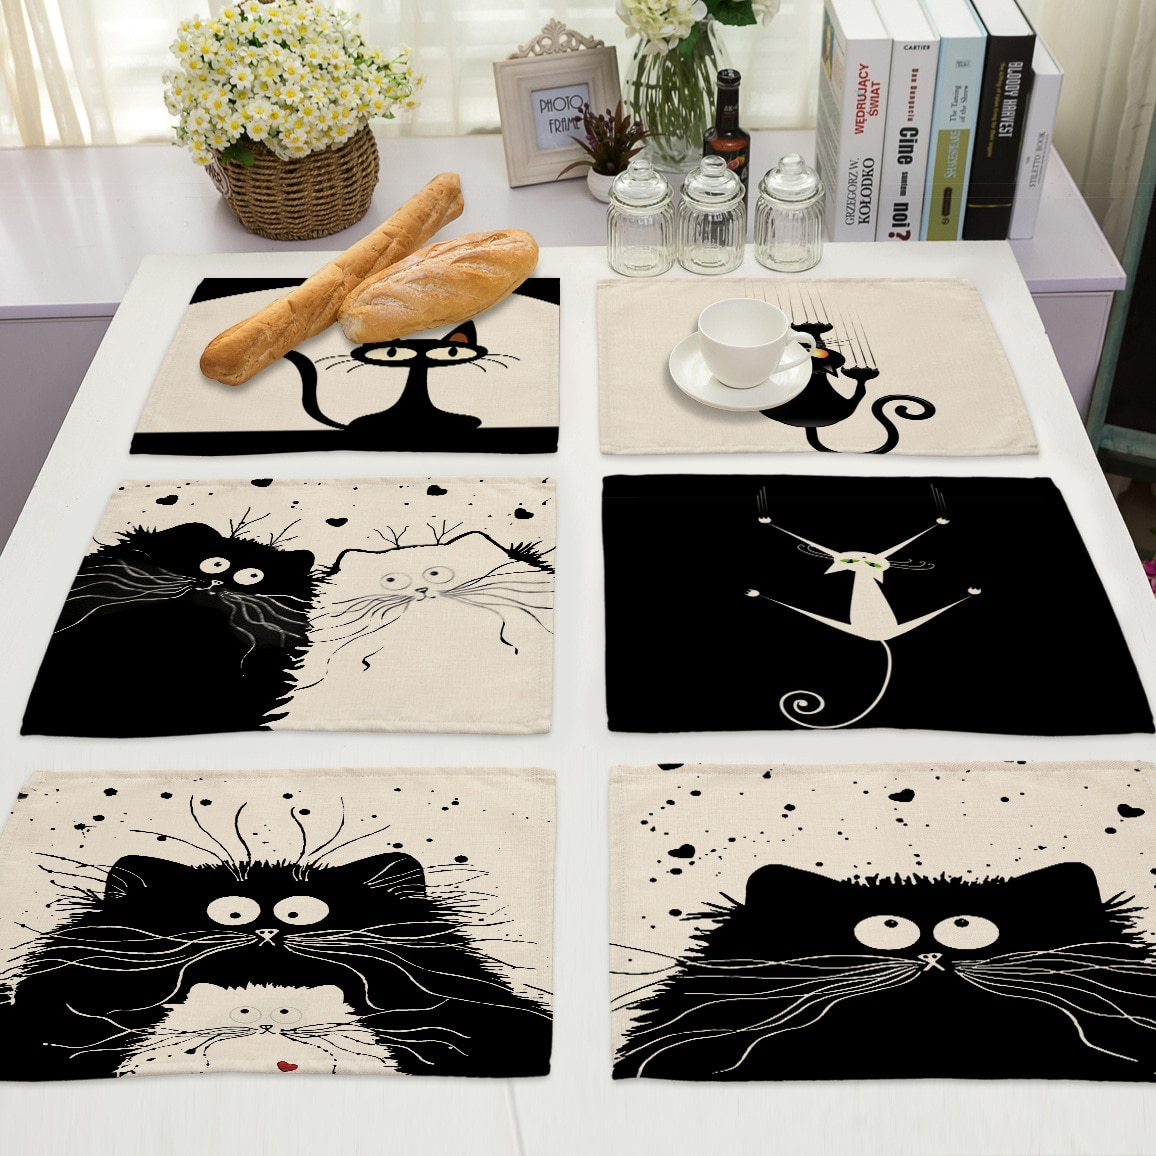 Mantel Individual para mesa de comedor, salvamanteles de aislamiento térmico, mantel negro para gatos, manteles individuales de lino, posavasos, decoración